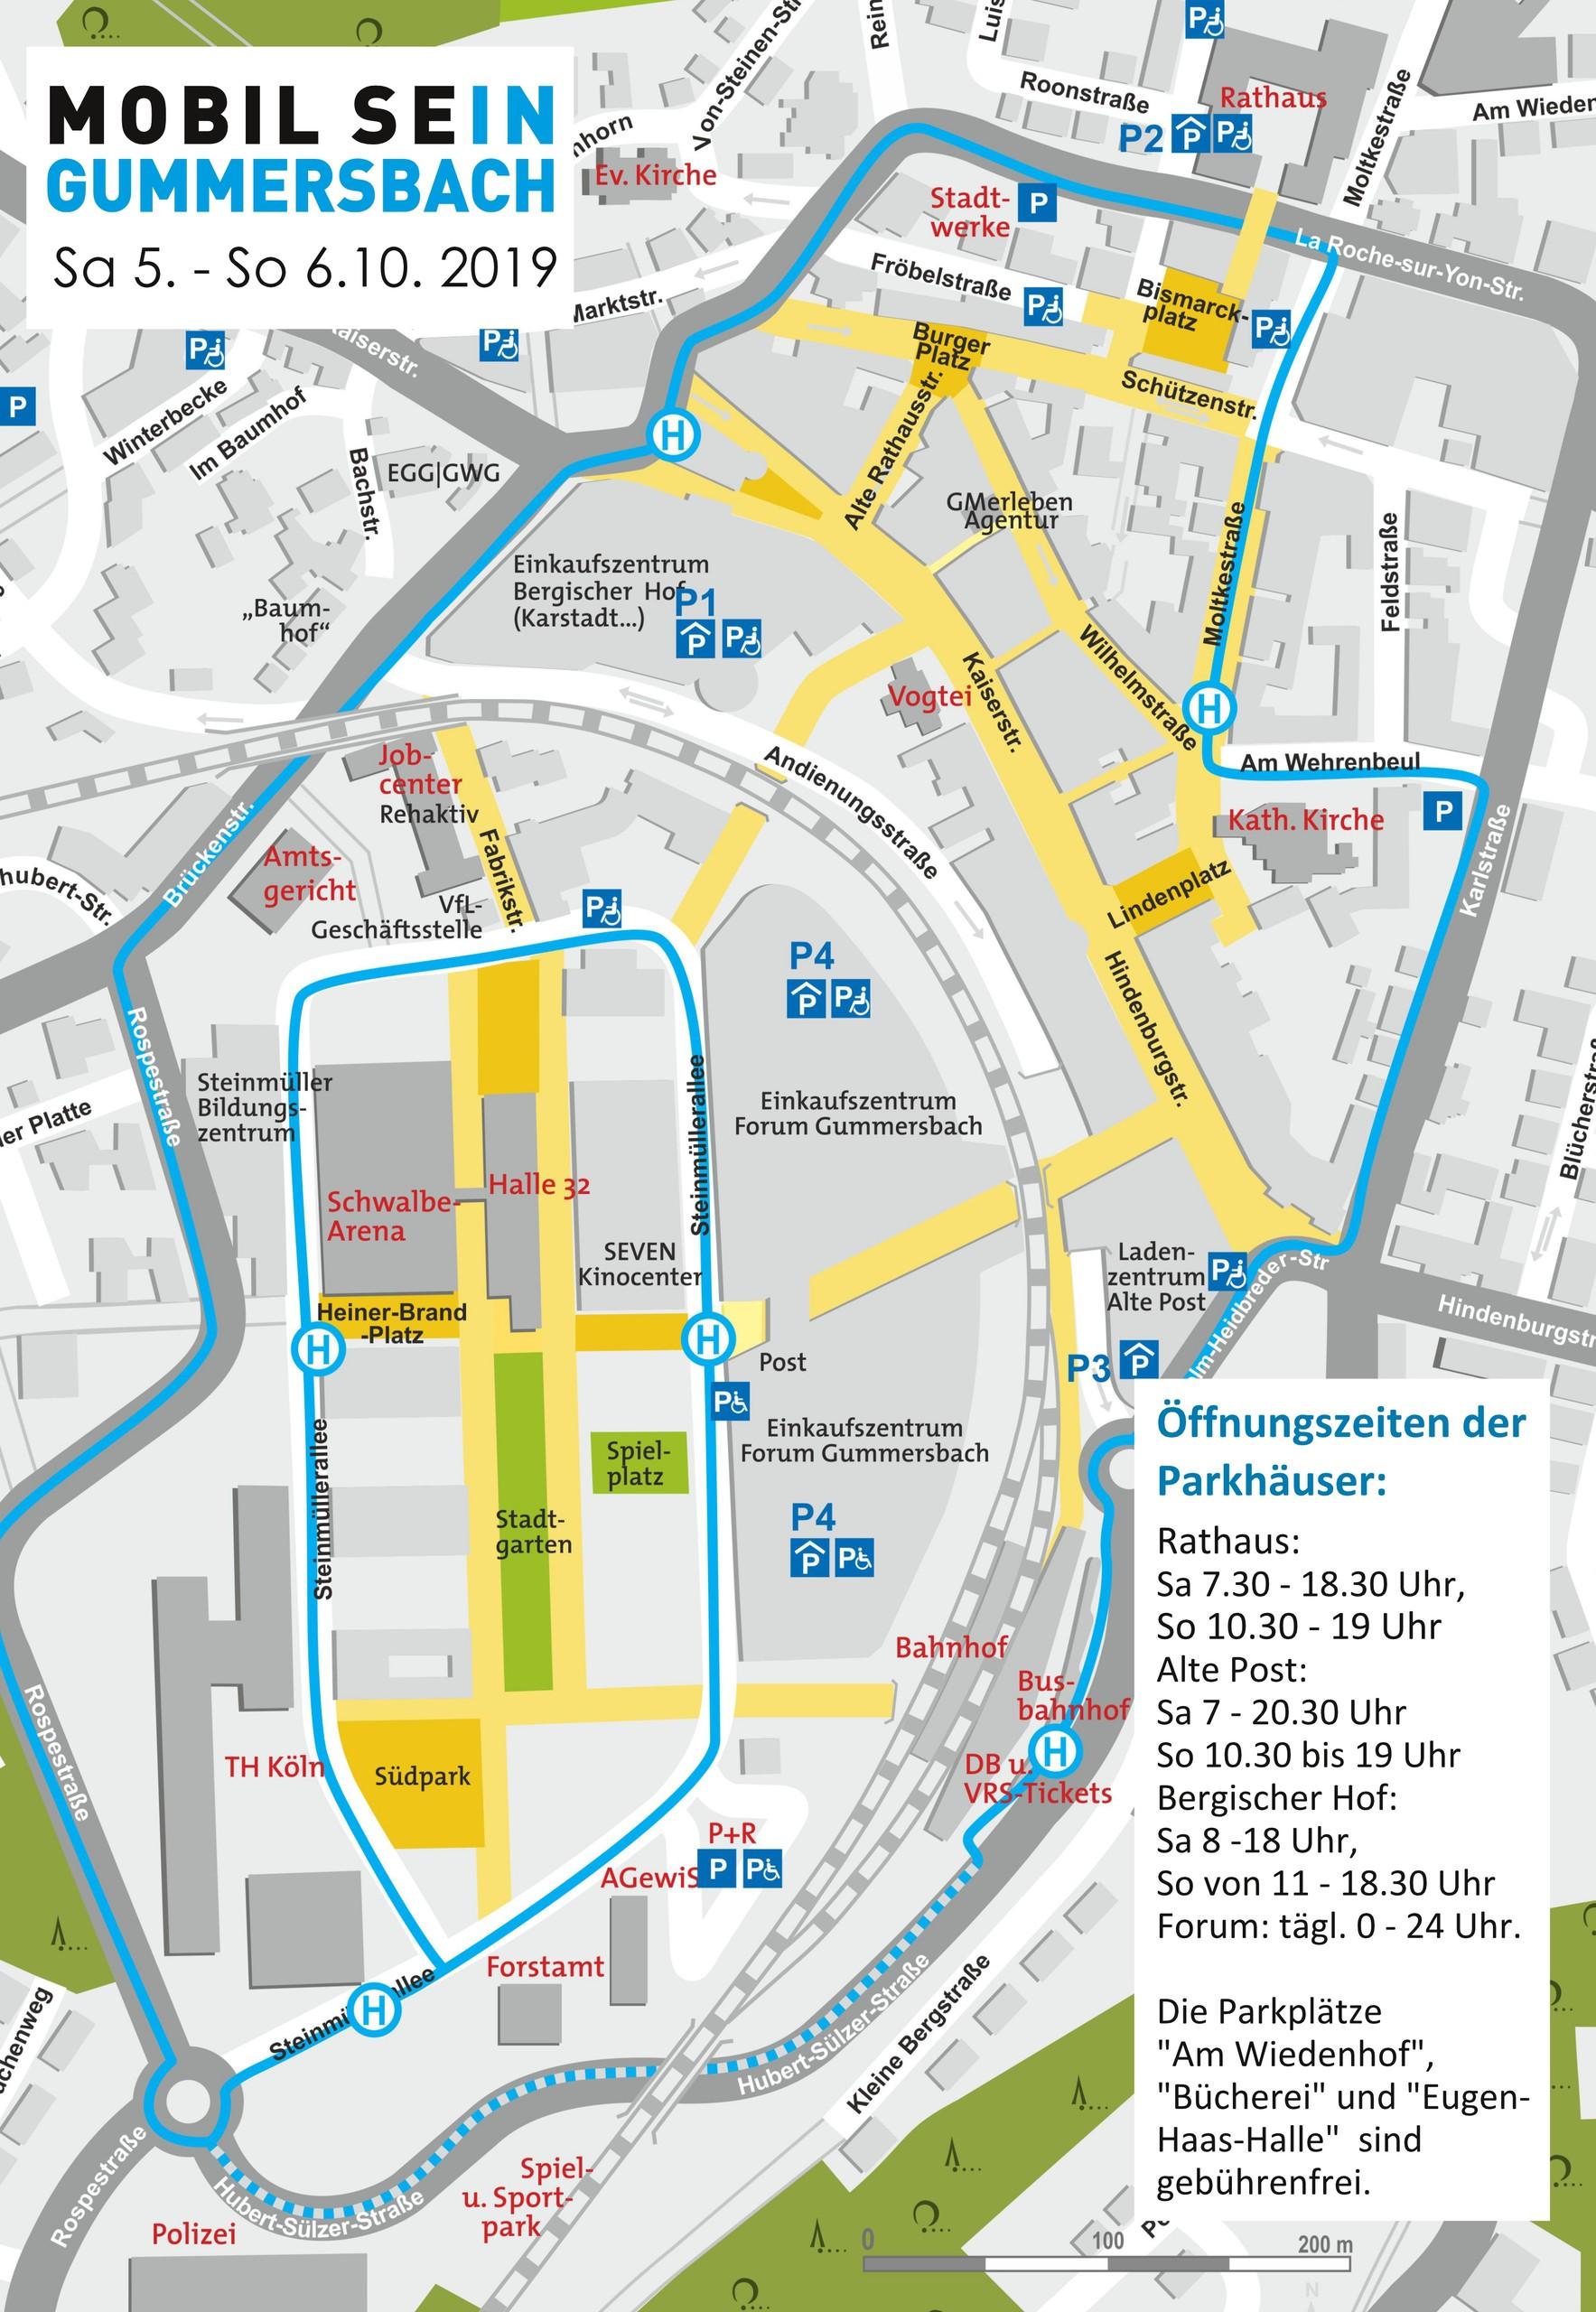 MOBIL SEIN Gummersbach 2019 Karte